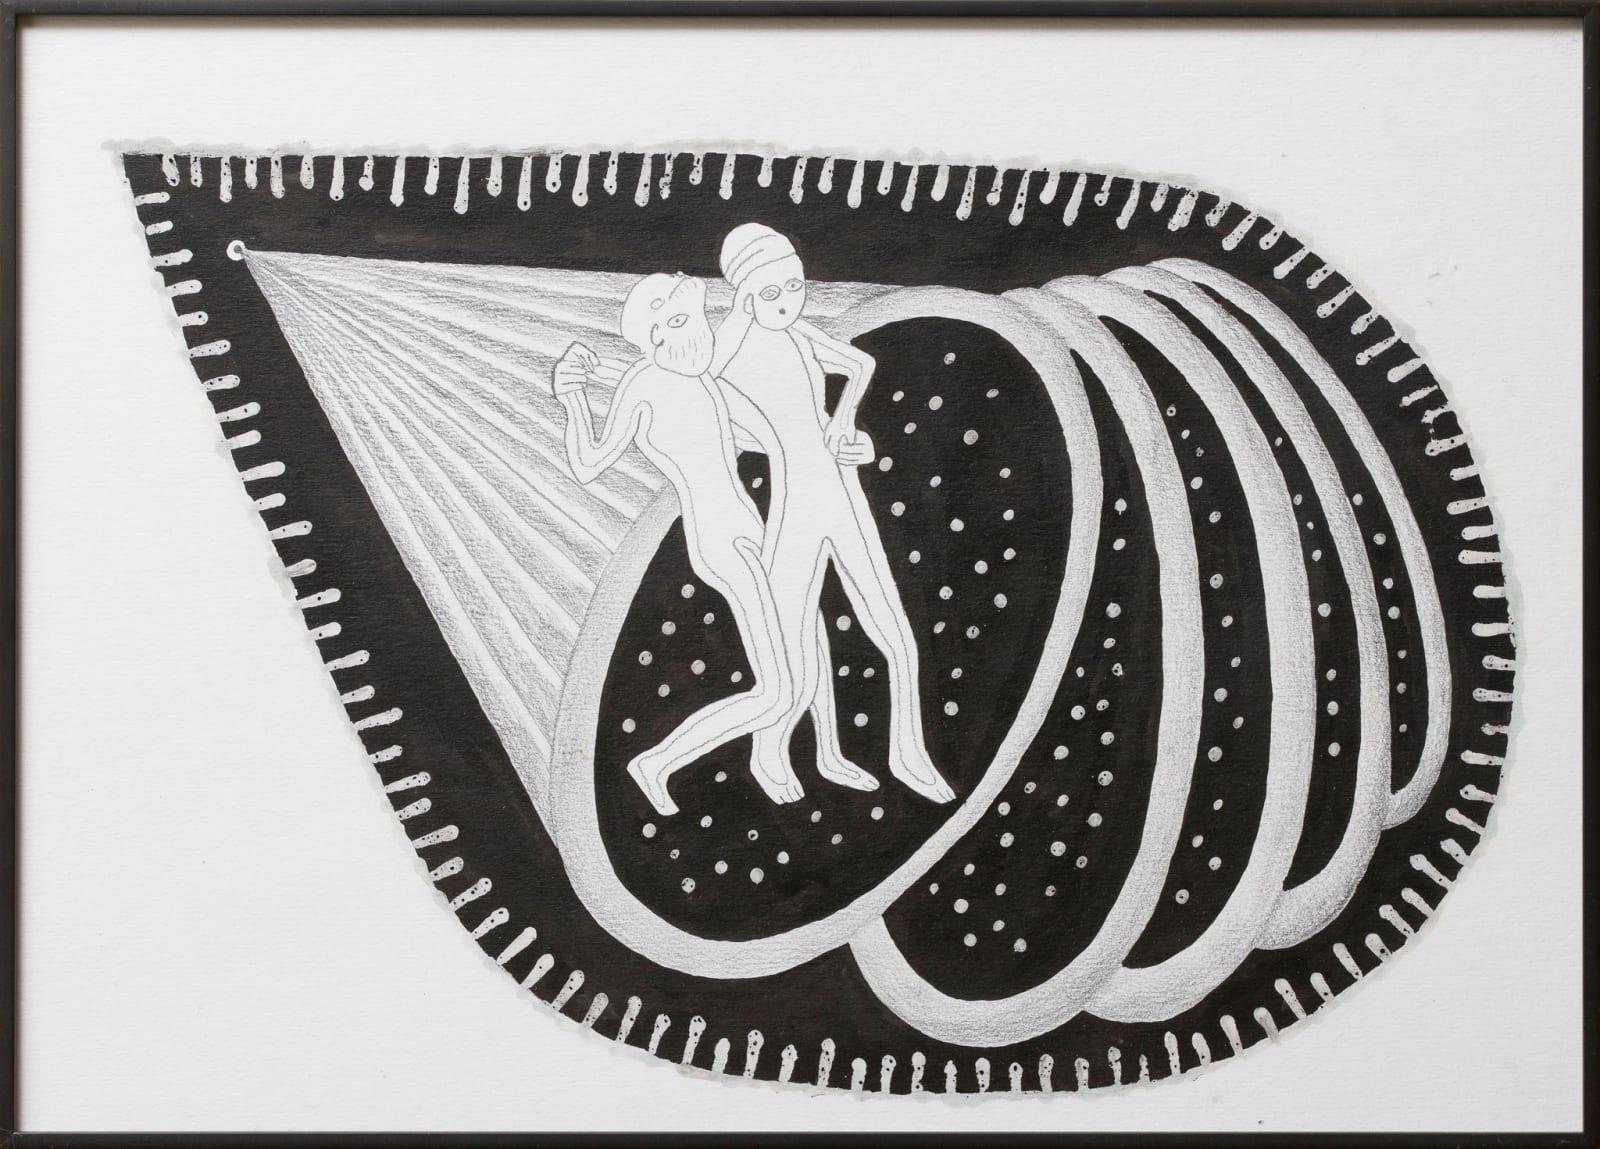 Anna Hulacova, Untitled, 2015 paper, graphite, ink, wax, 30 x 42,5 x 2 cm